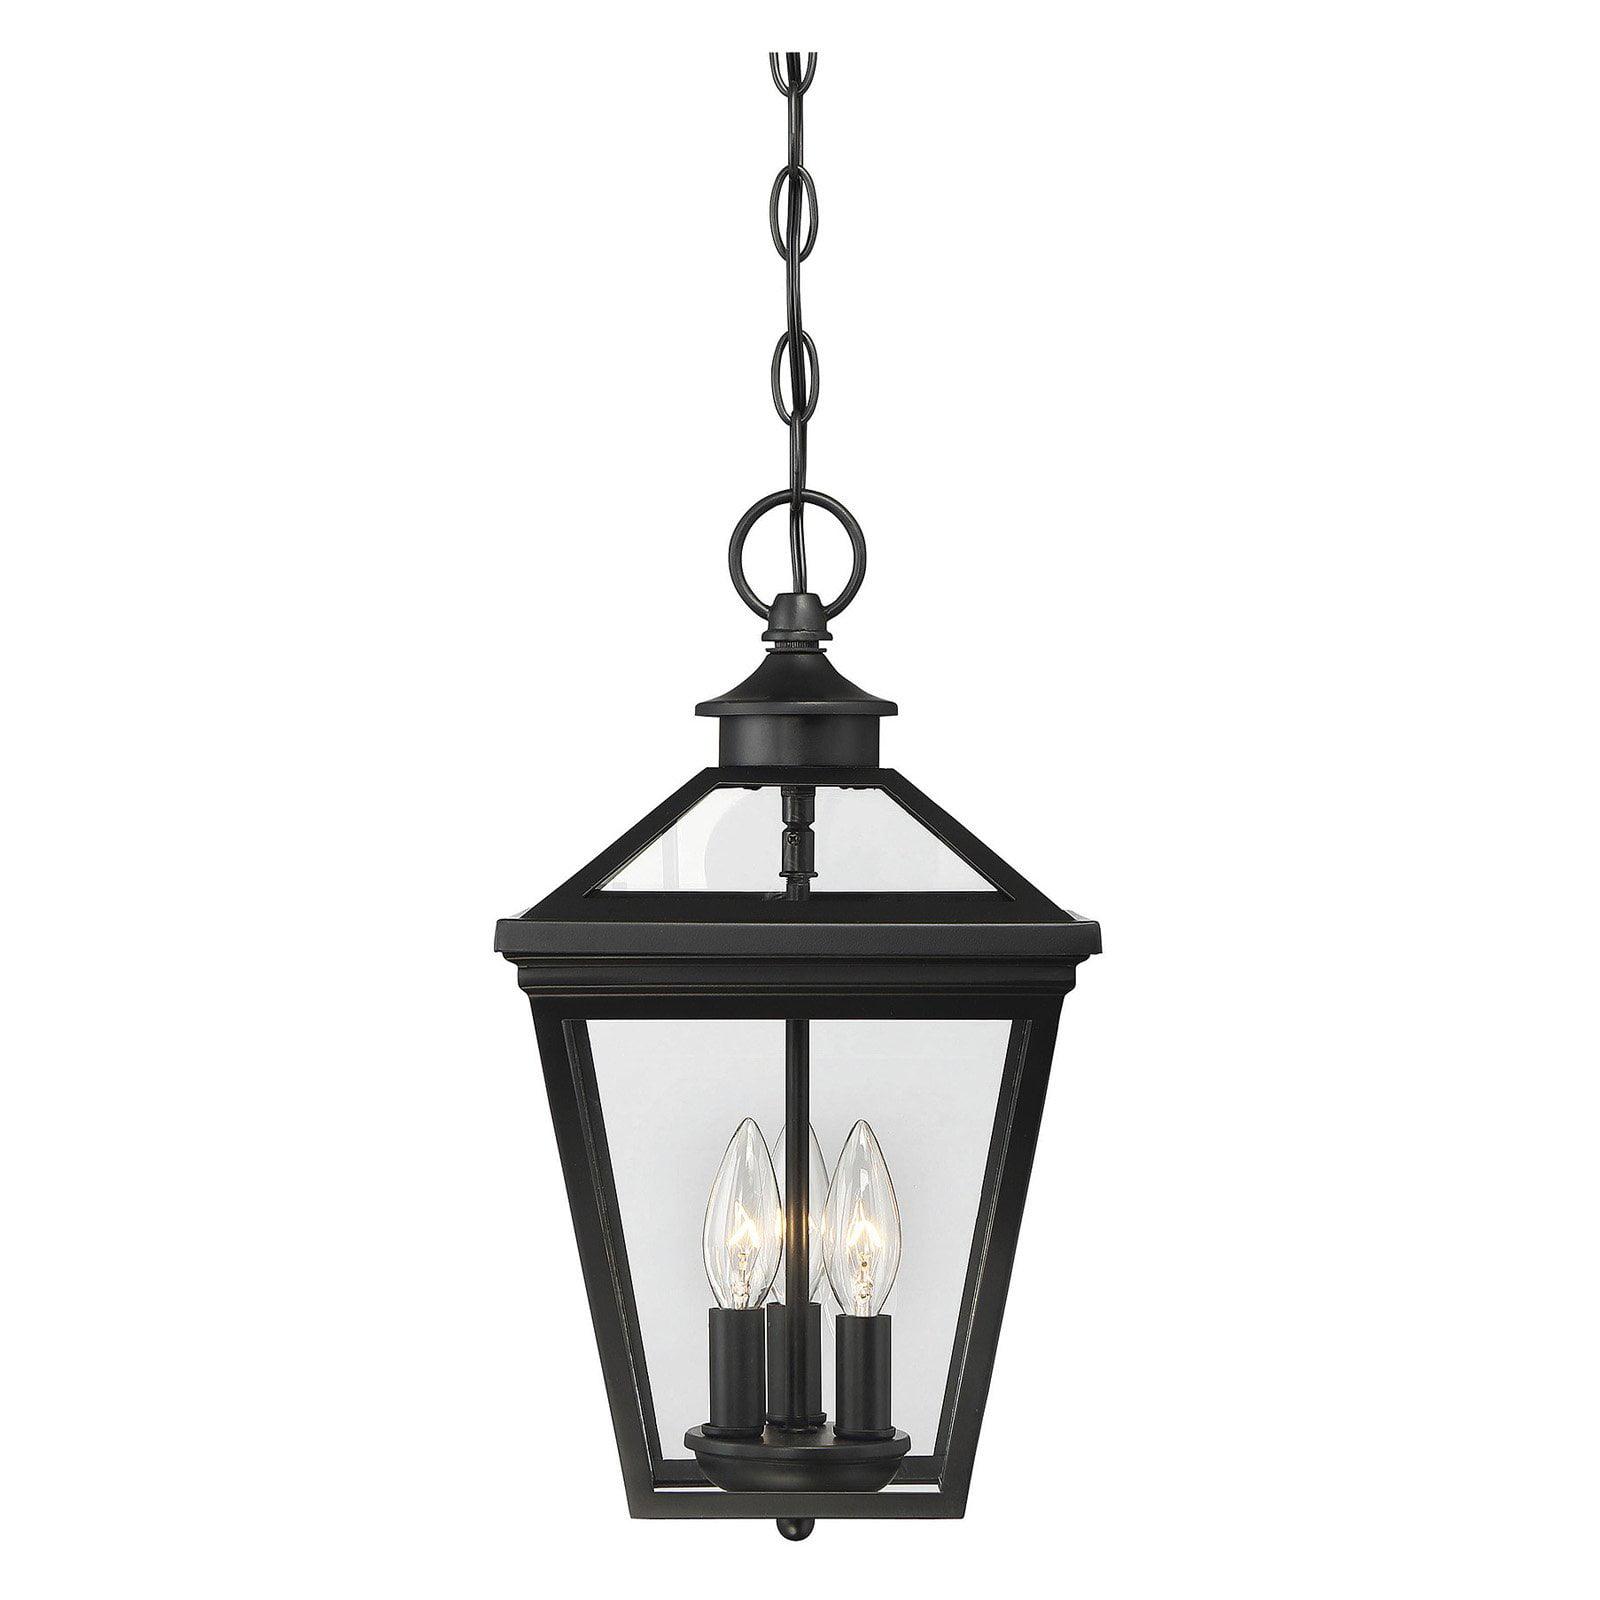 Savoy House Ellijay 5-146 Outdoor Hanging Lantern by Savoy House